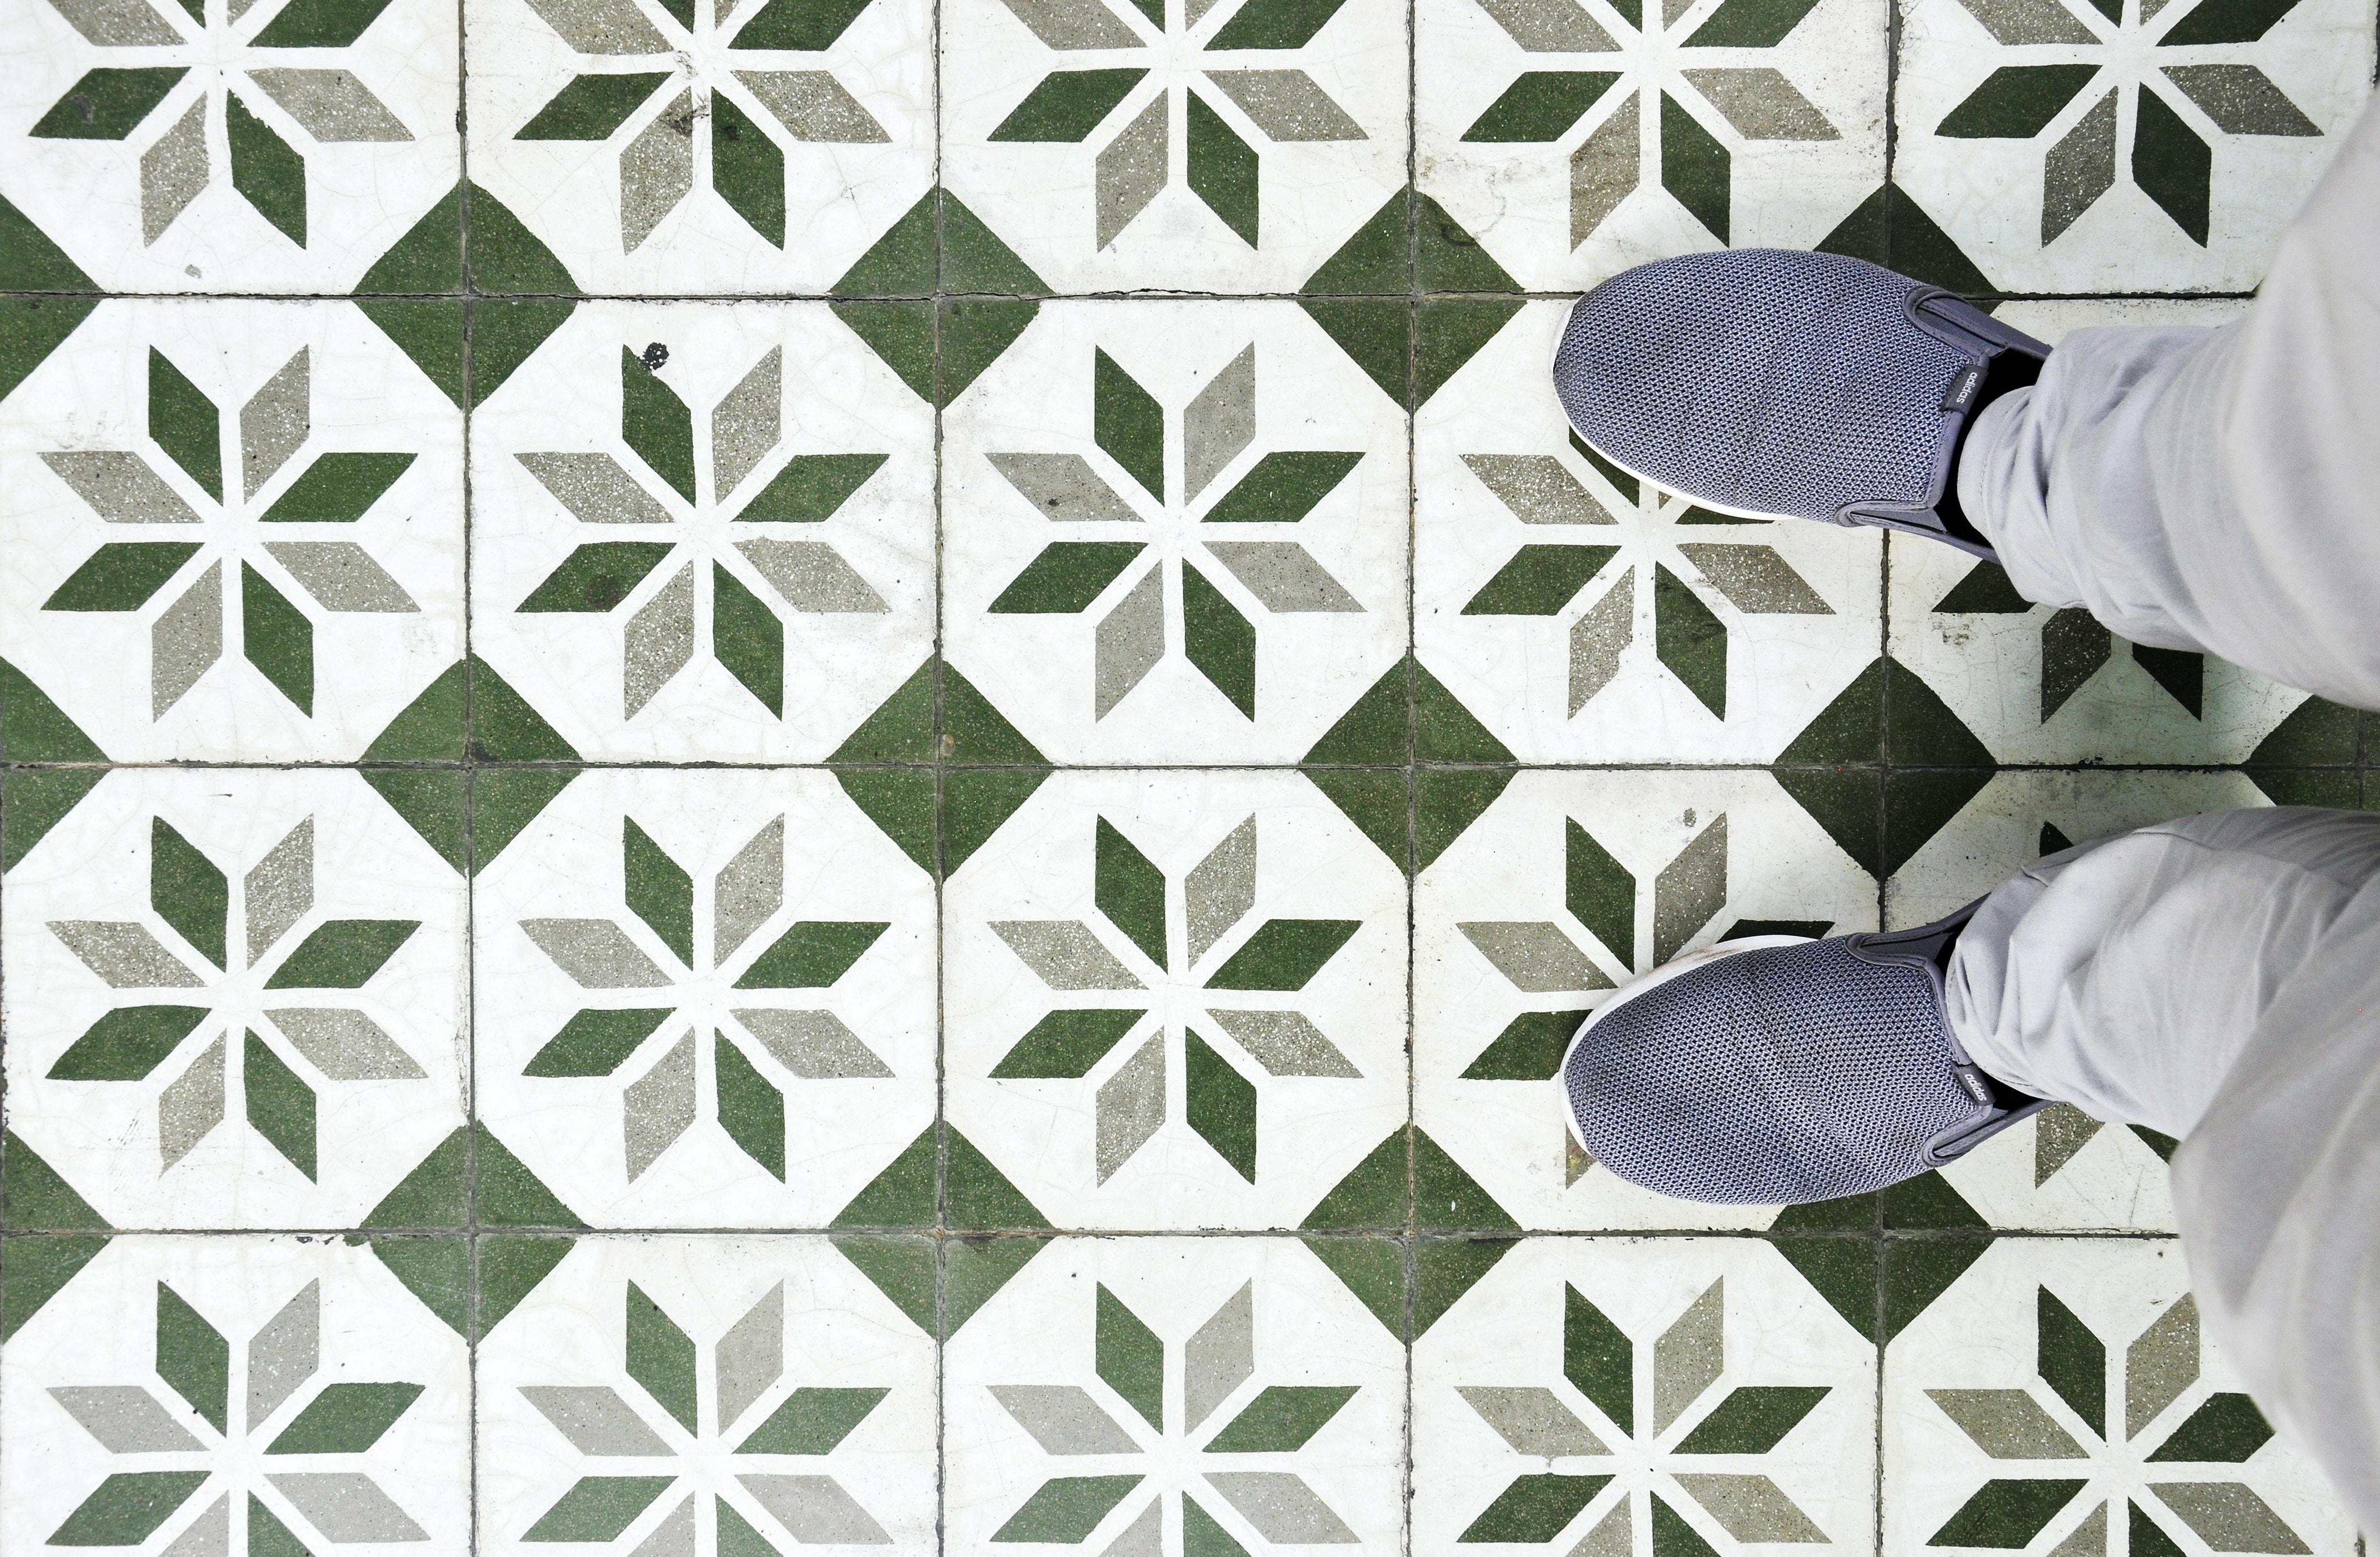 green and white tile flooring